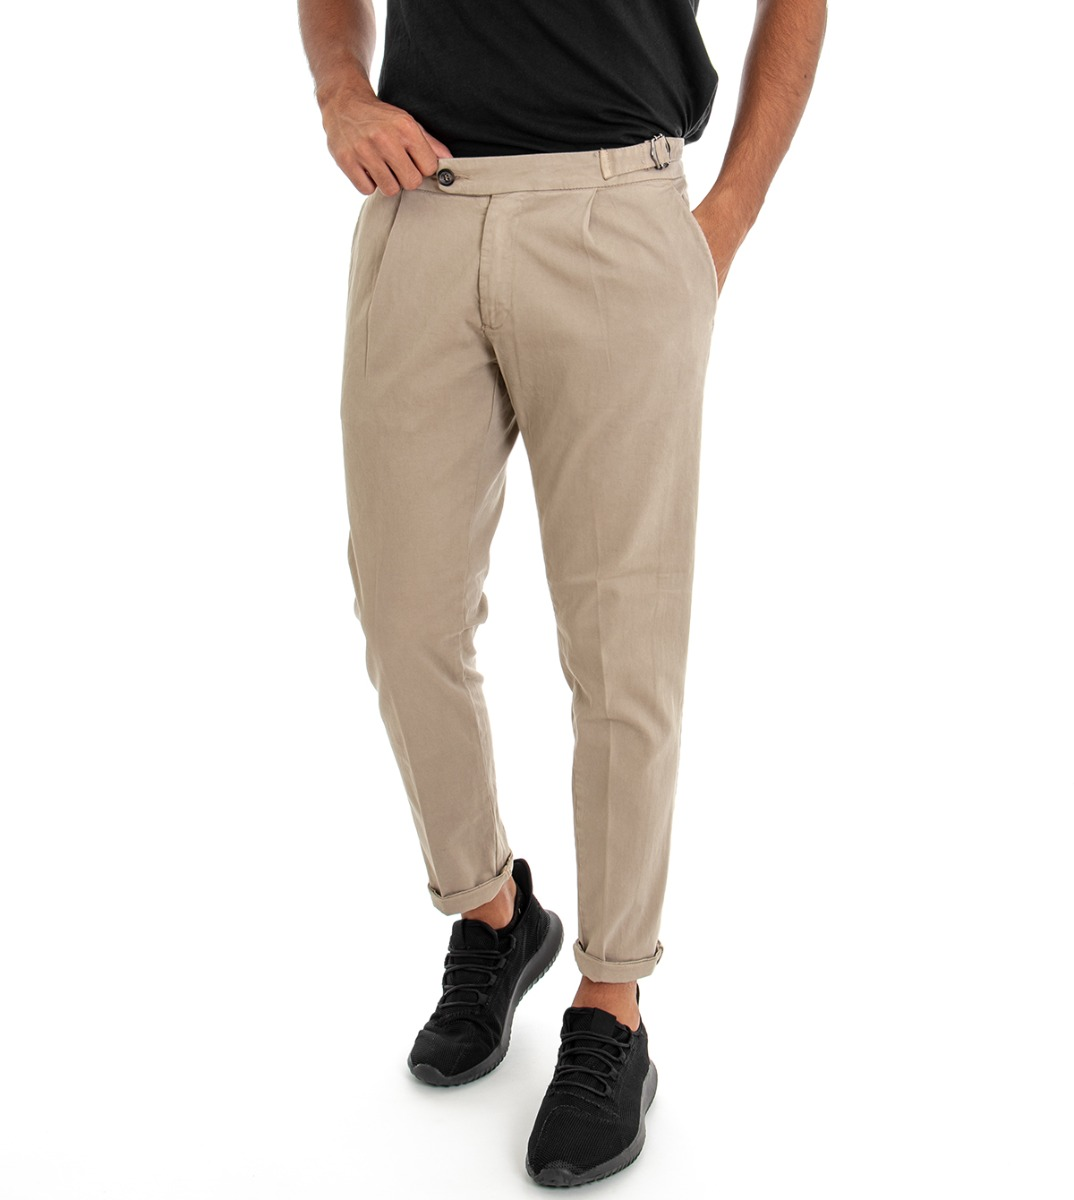 Pantalone Tasca America Uomo Con Pence Tinta Unita Beige Regular Fit GIOSAL